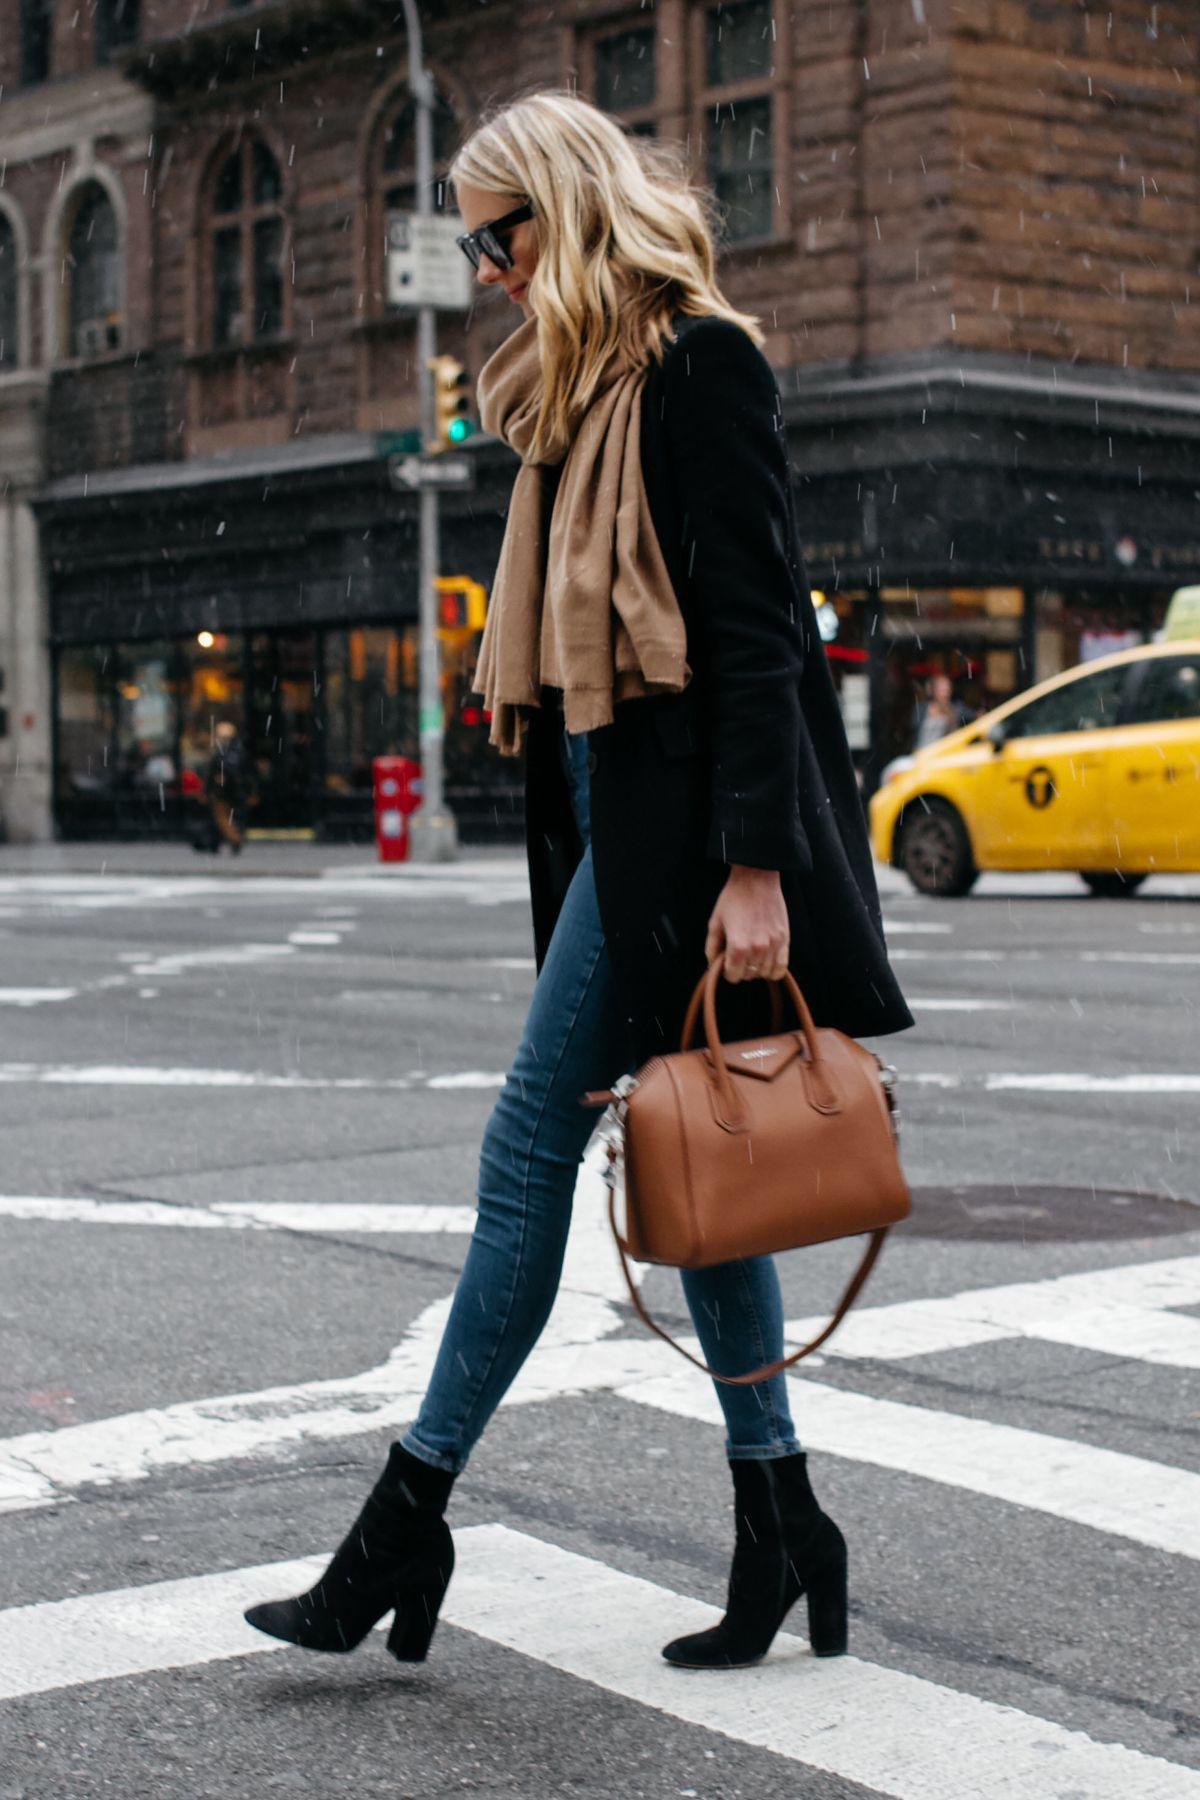 Brown bag black boots, Slim-fit pants